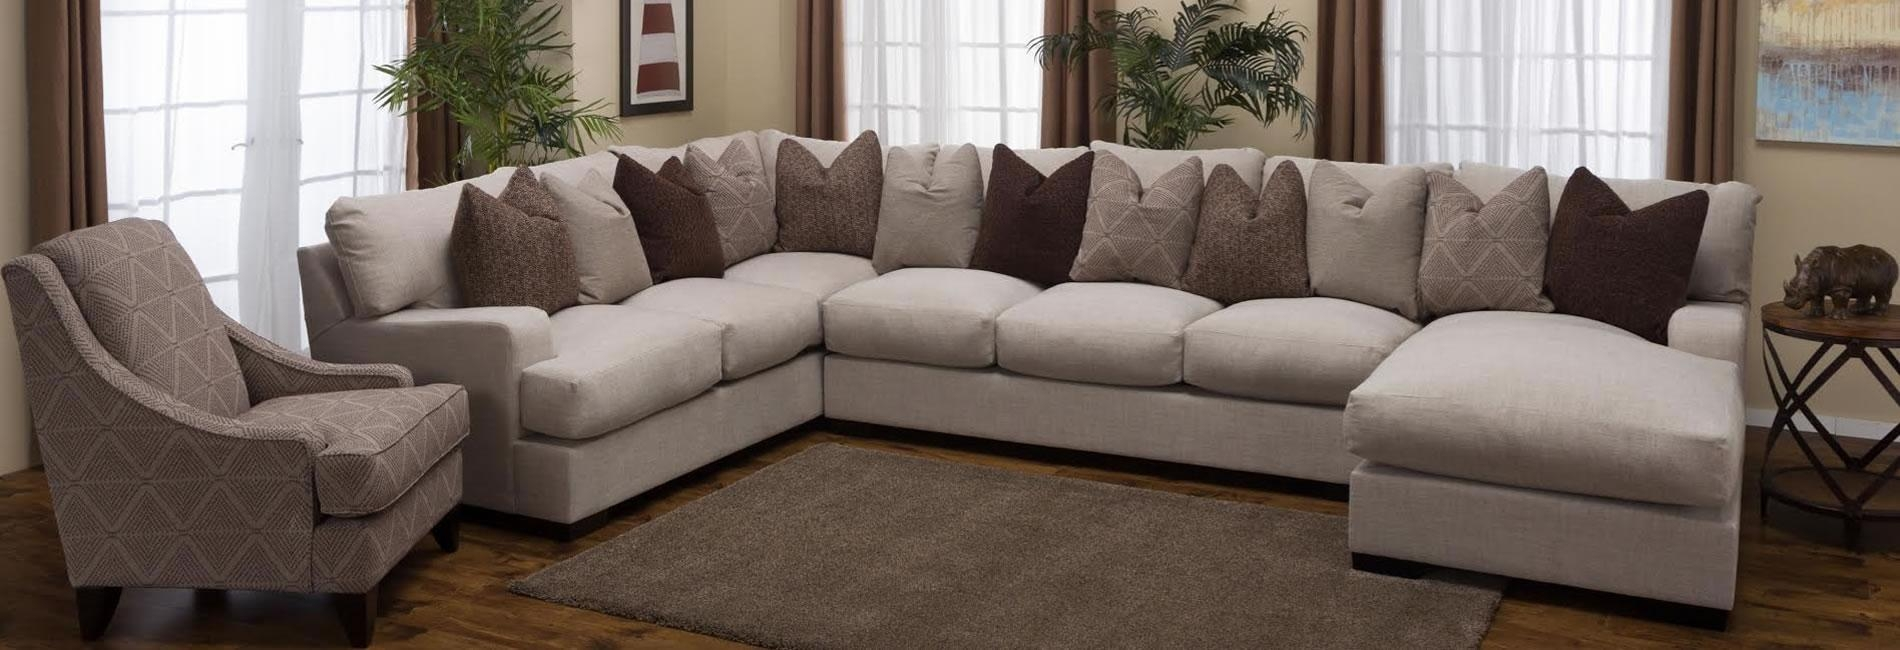 Furniture (Image 13 of 20)